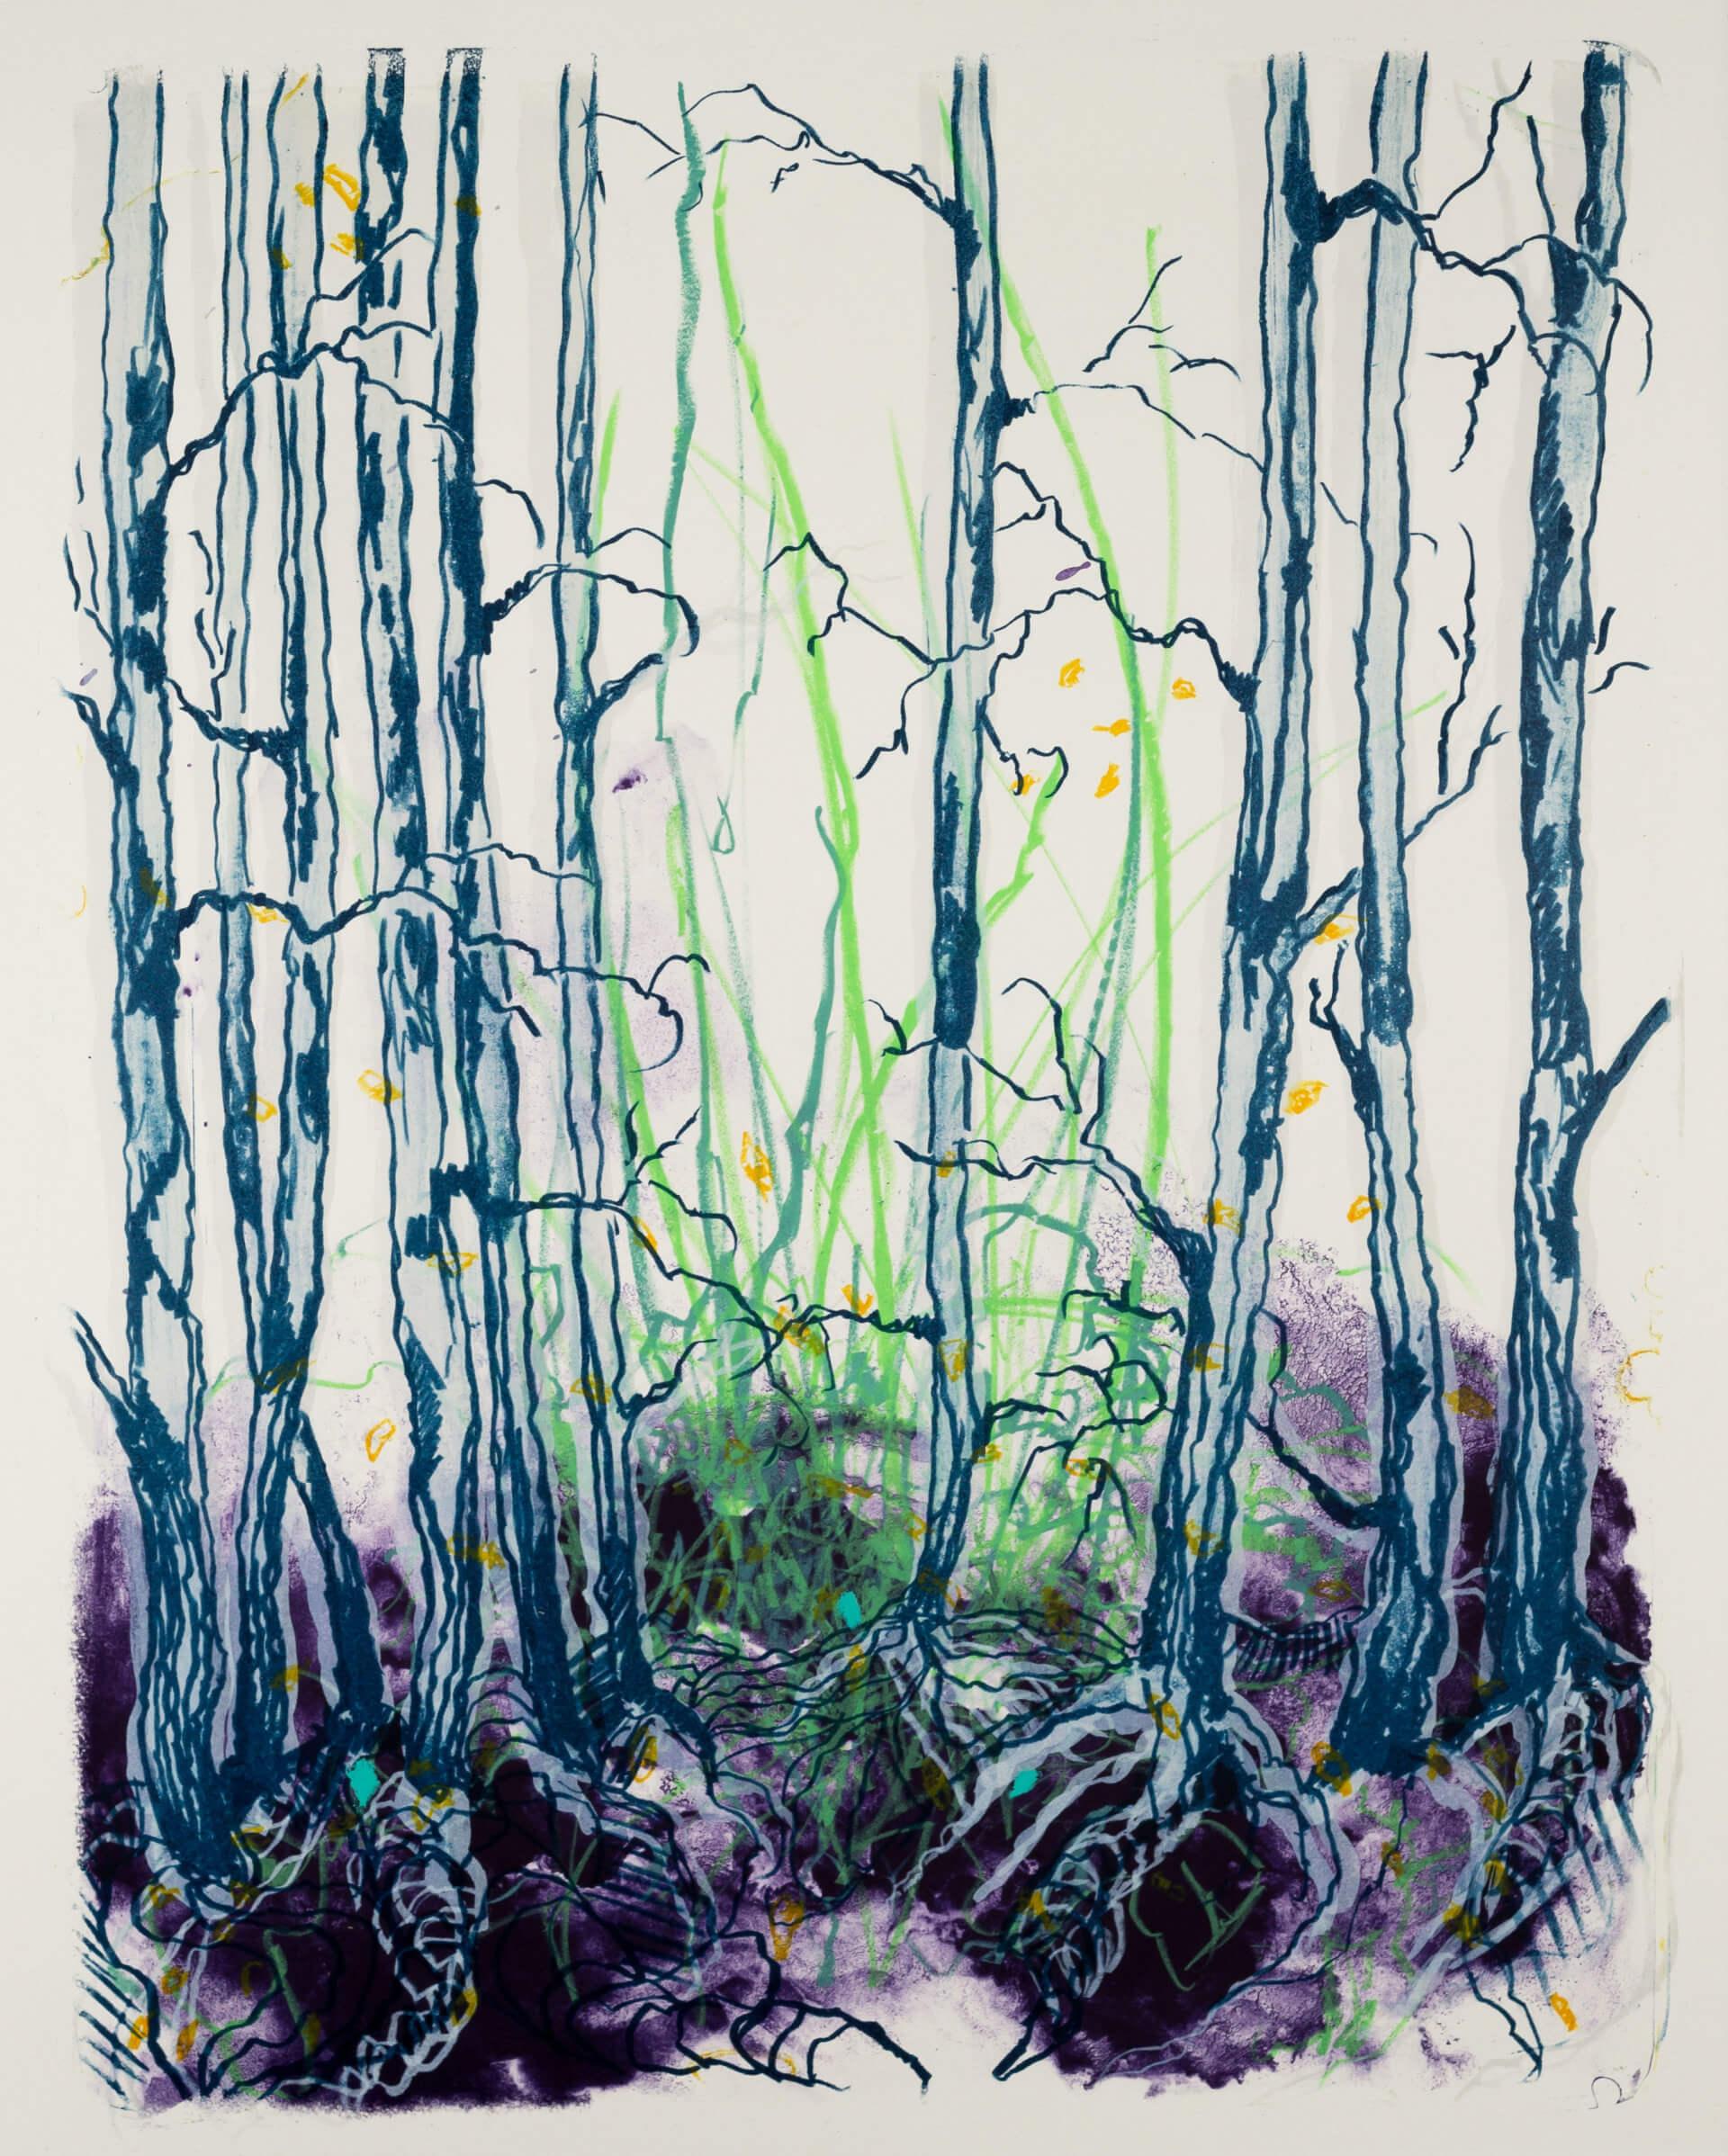 Wald X(D)-IX, 2019, Farblithographie, Unikat, 50x40 cm